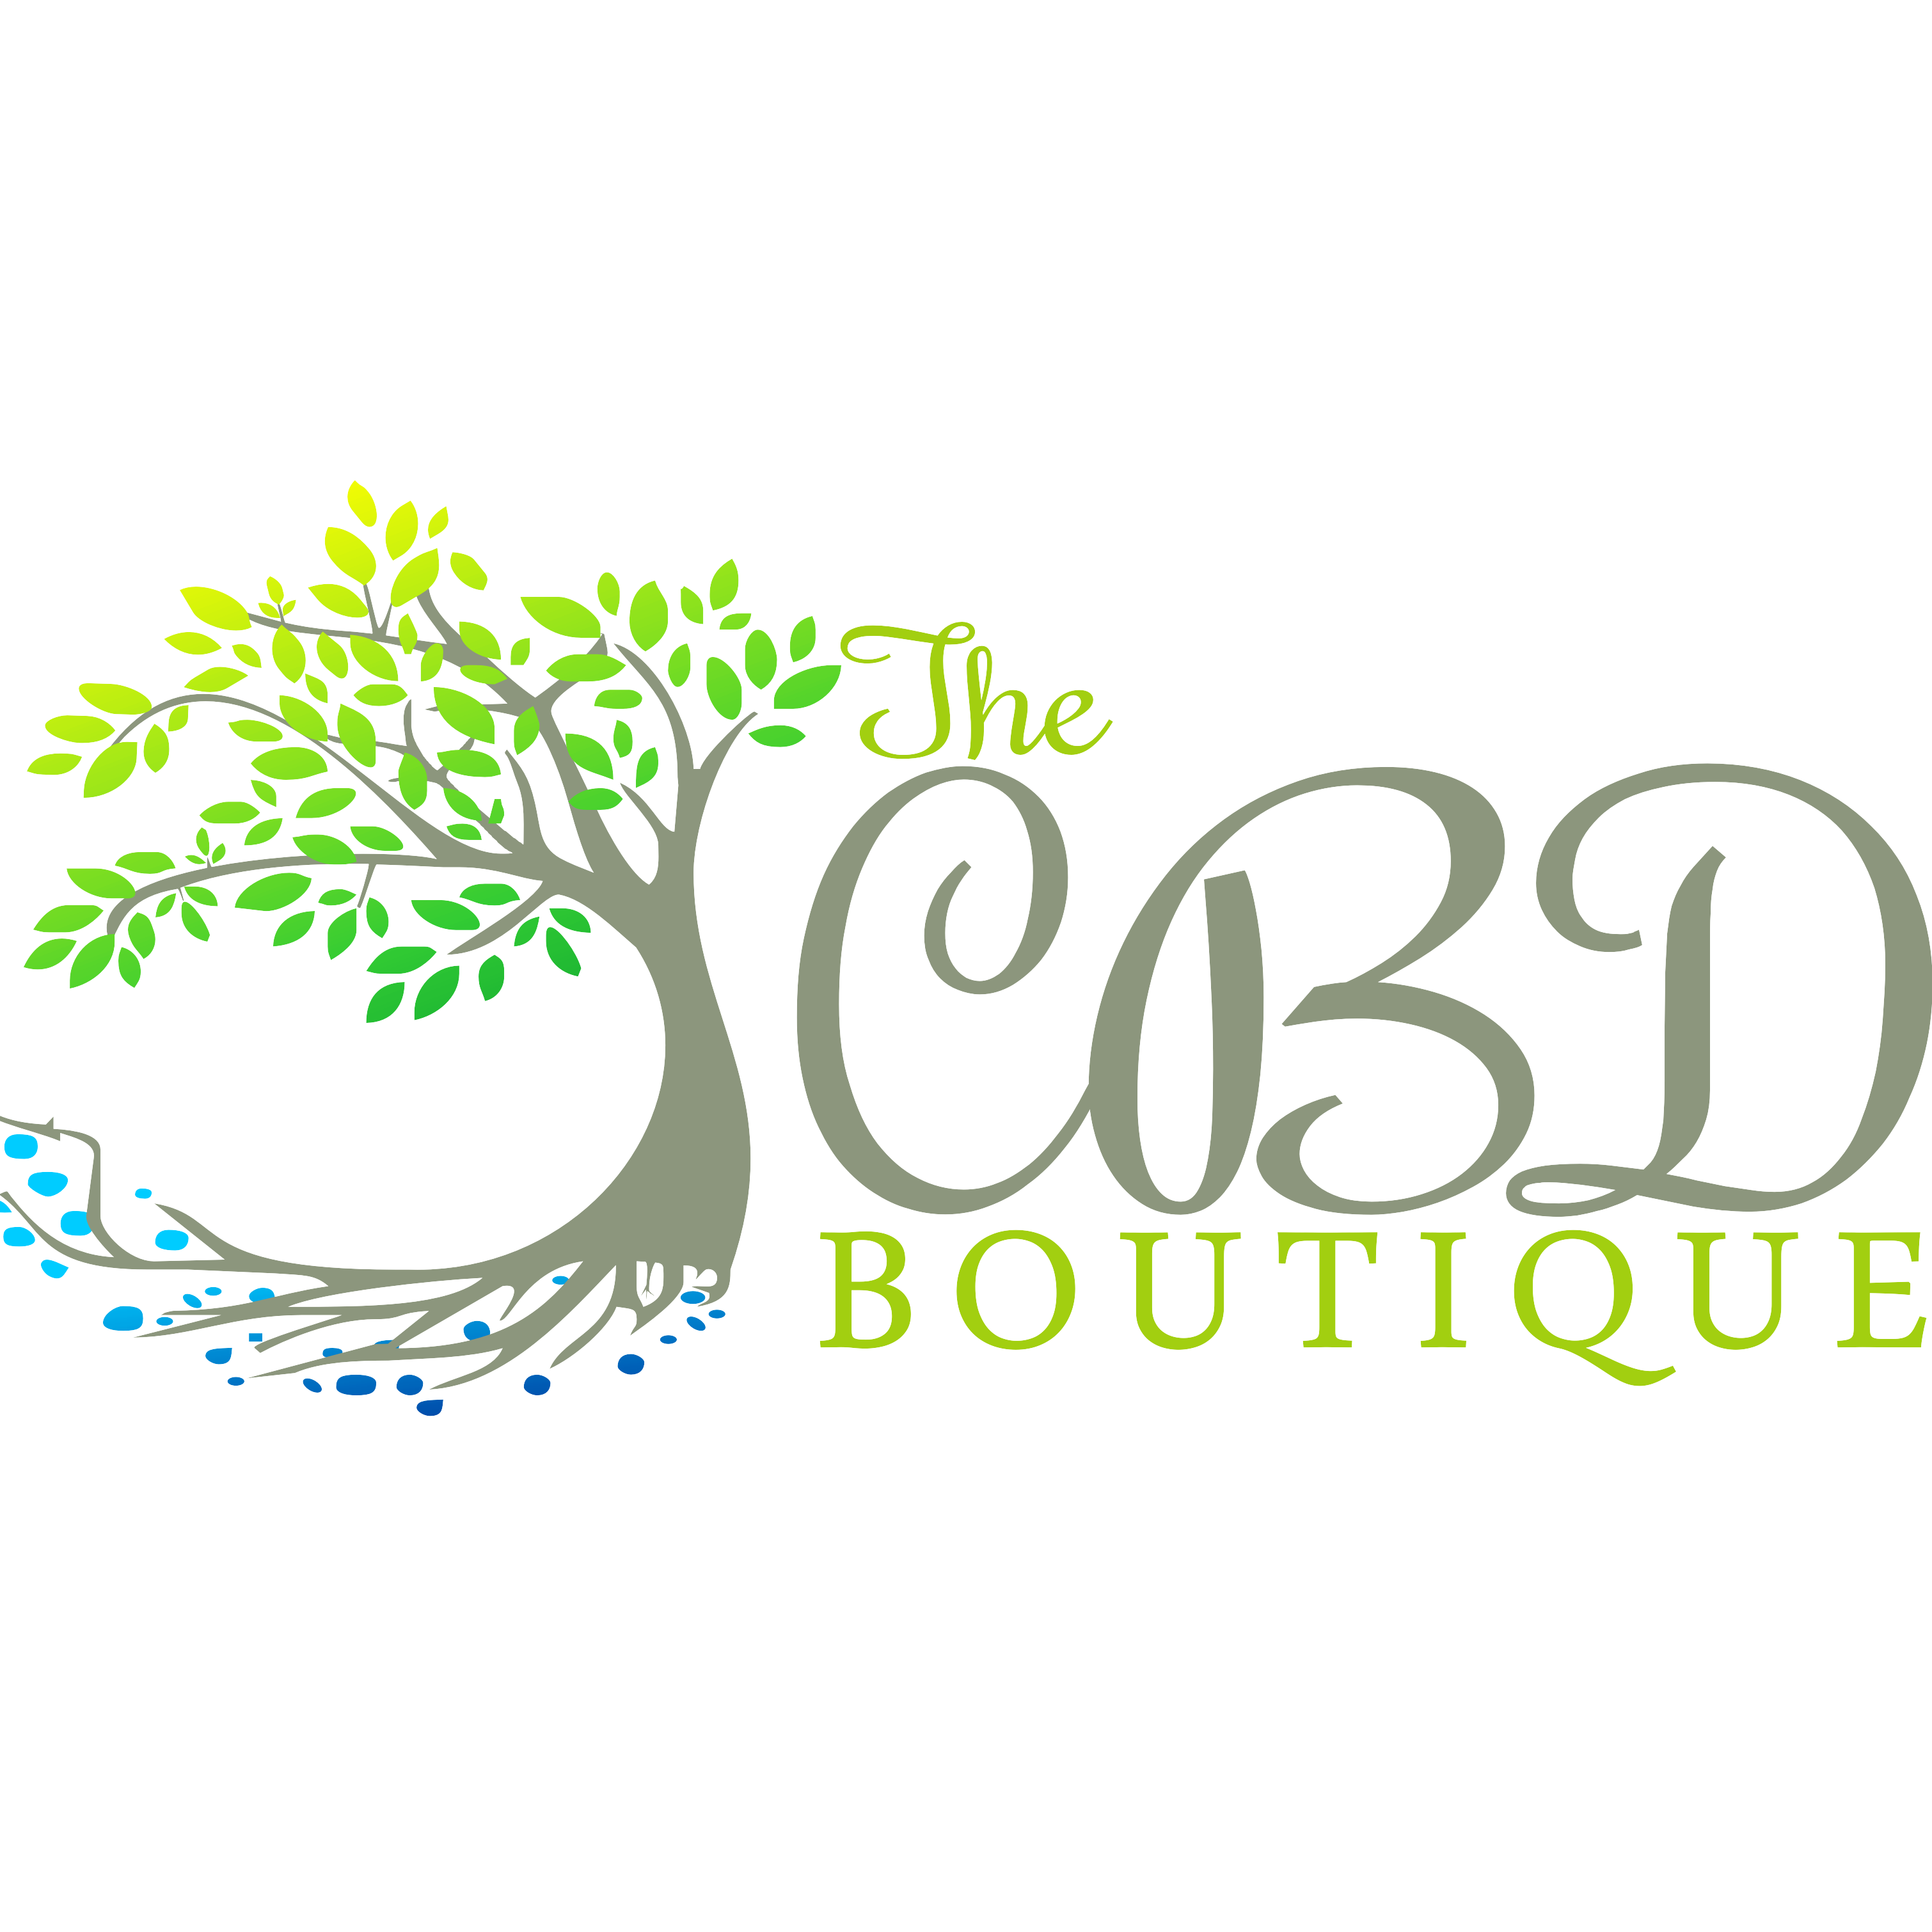 The CBD Boutique